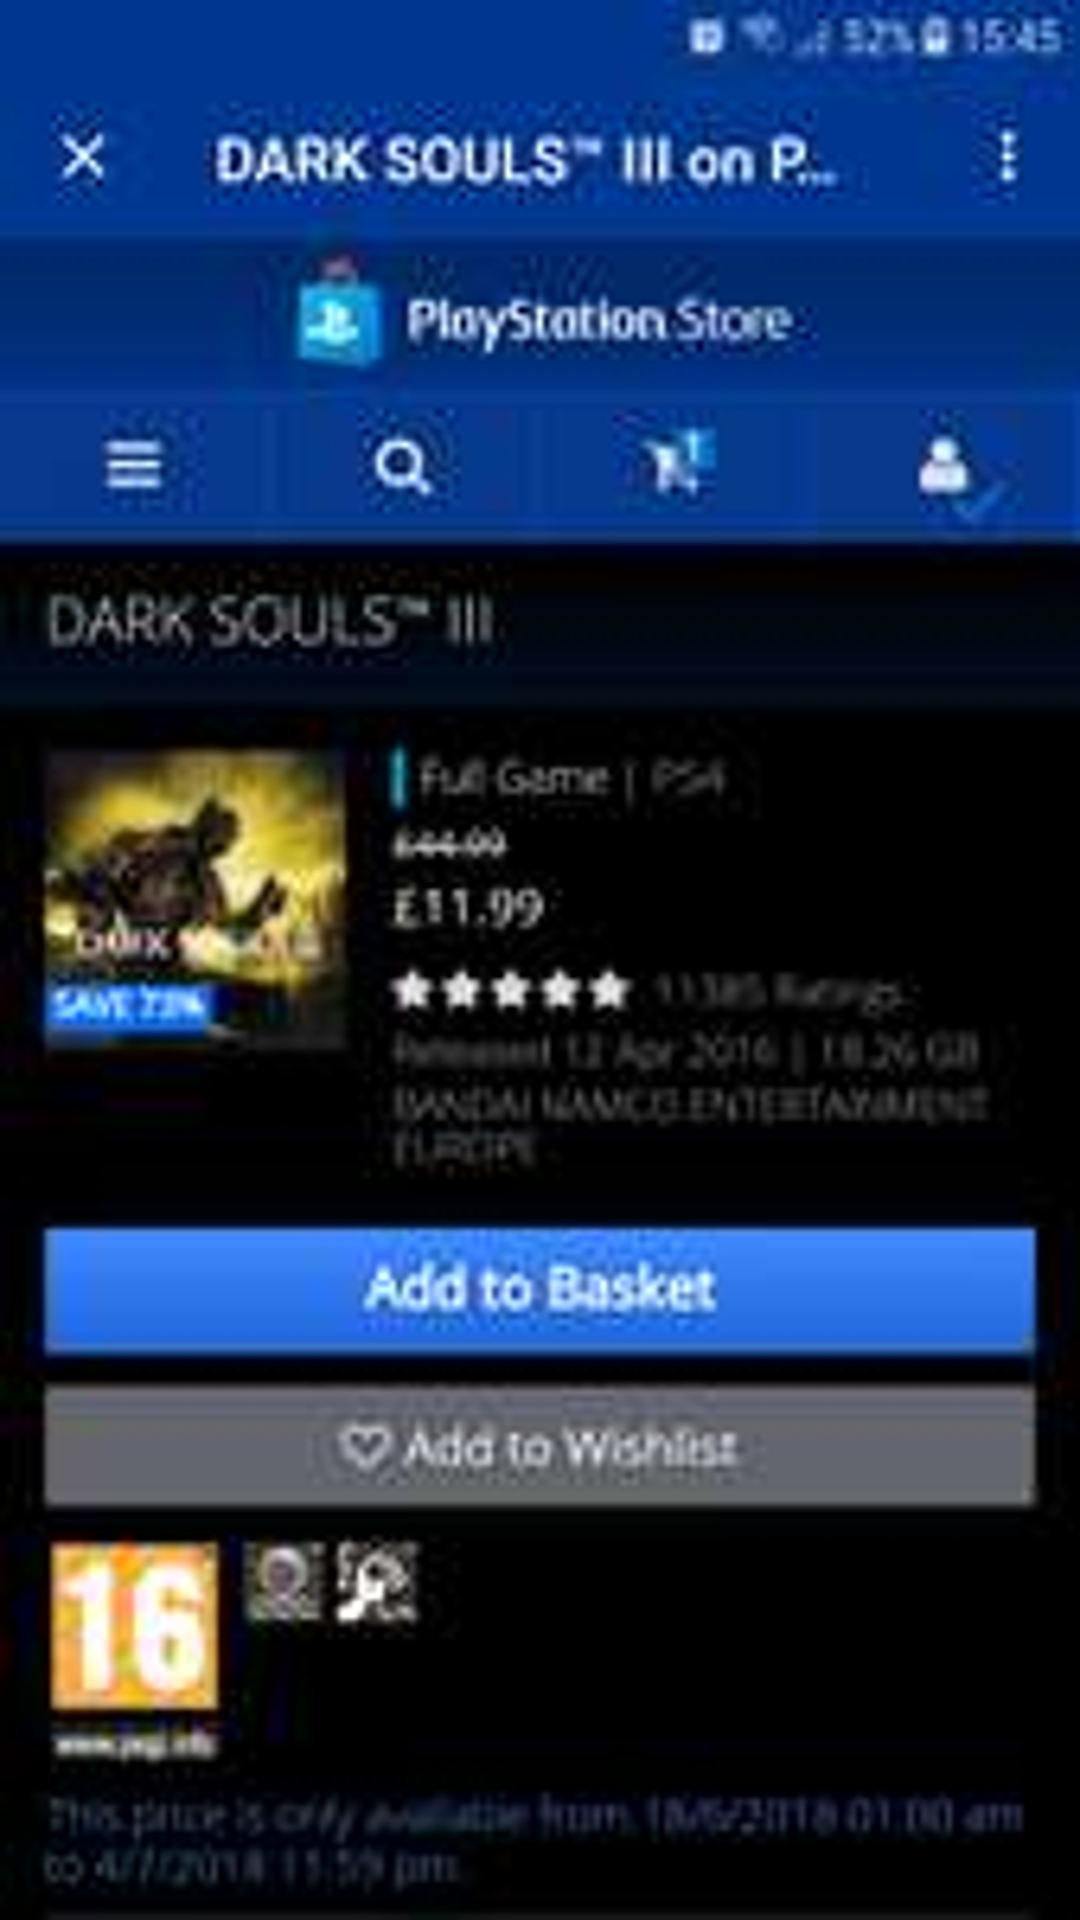 Dark Souls 3 £11.99 @ PSN